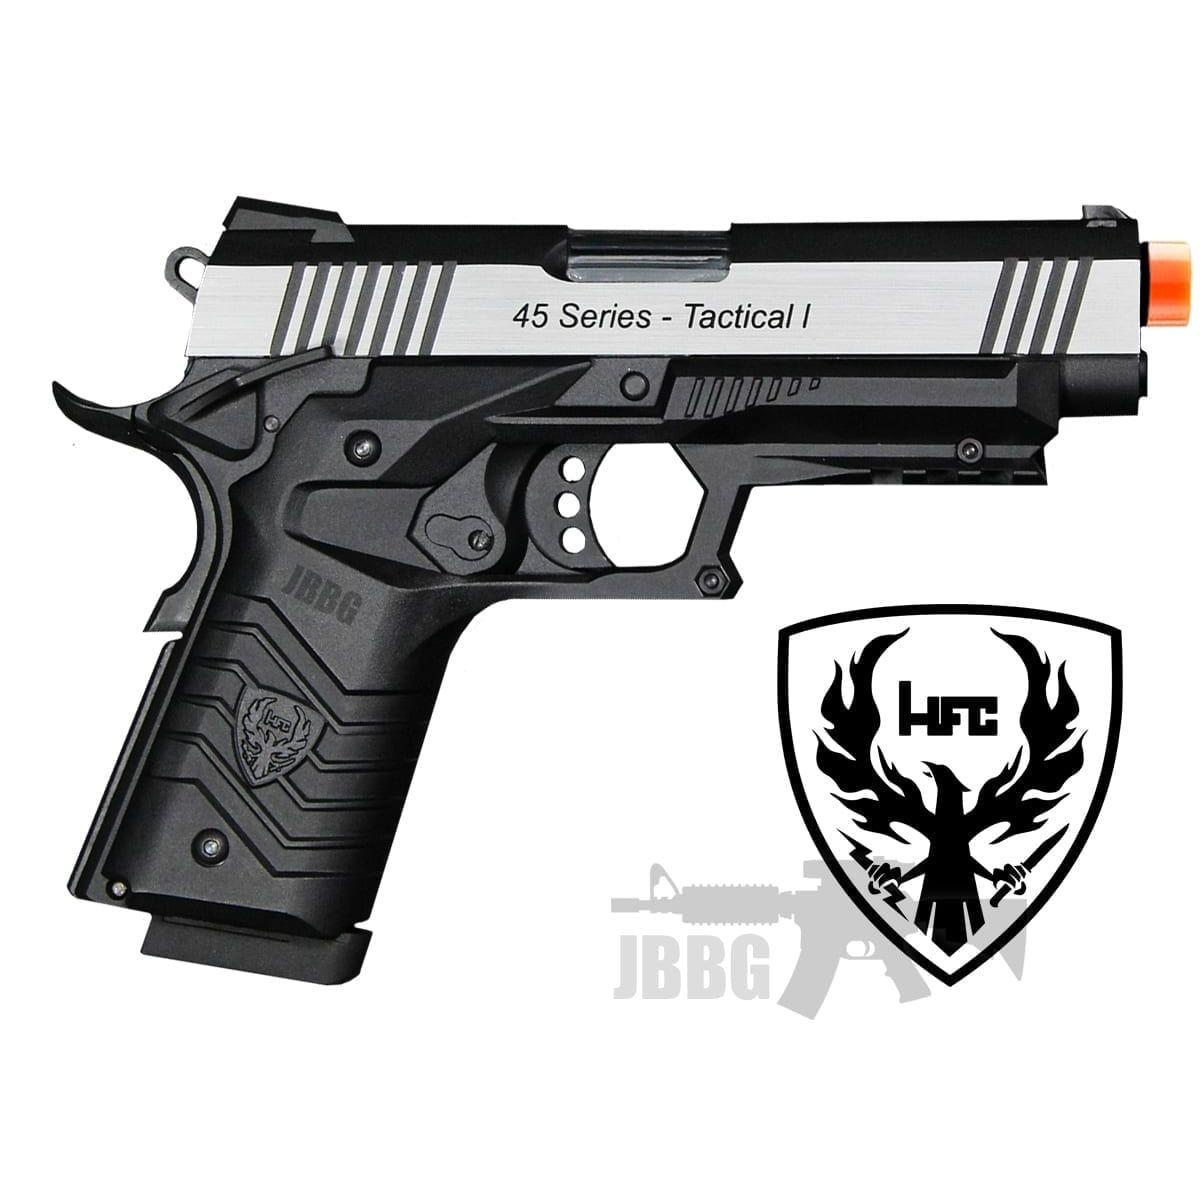 hg171 airsoft pistol